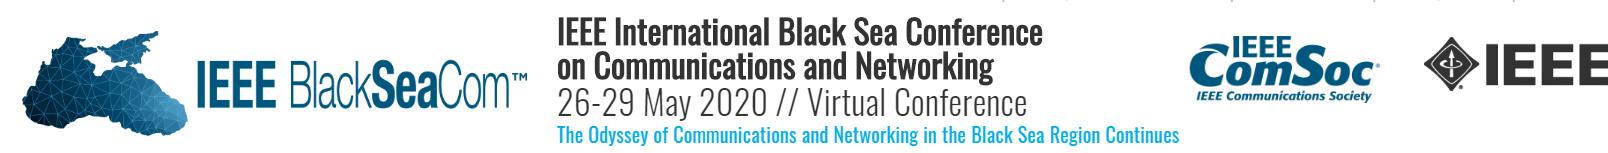 BlackSeaCom 2020